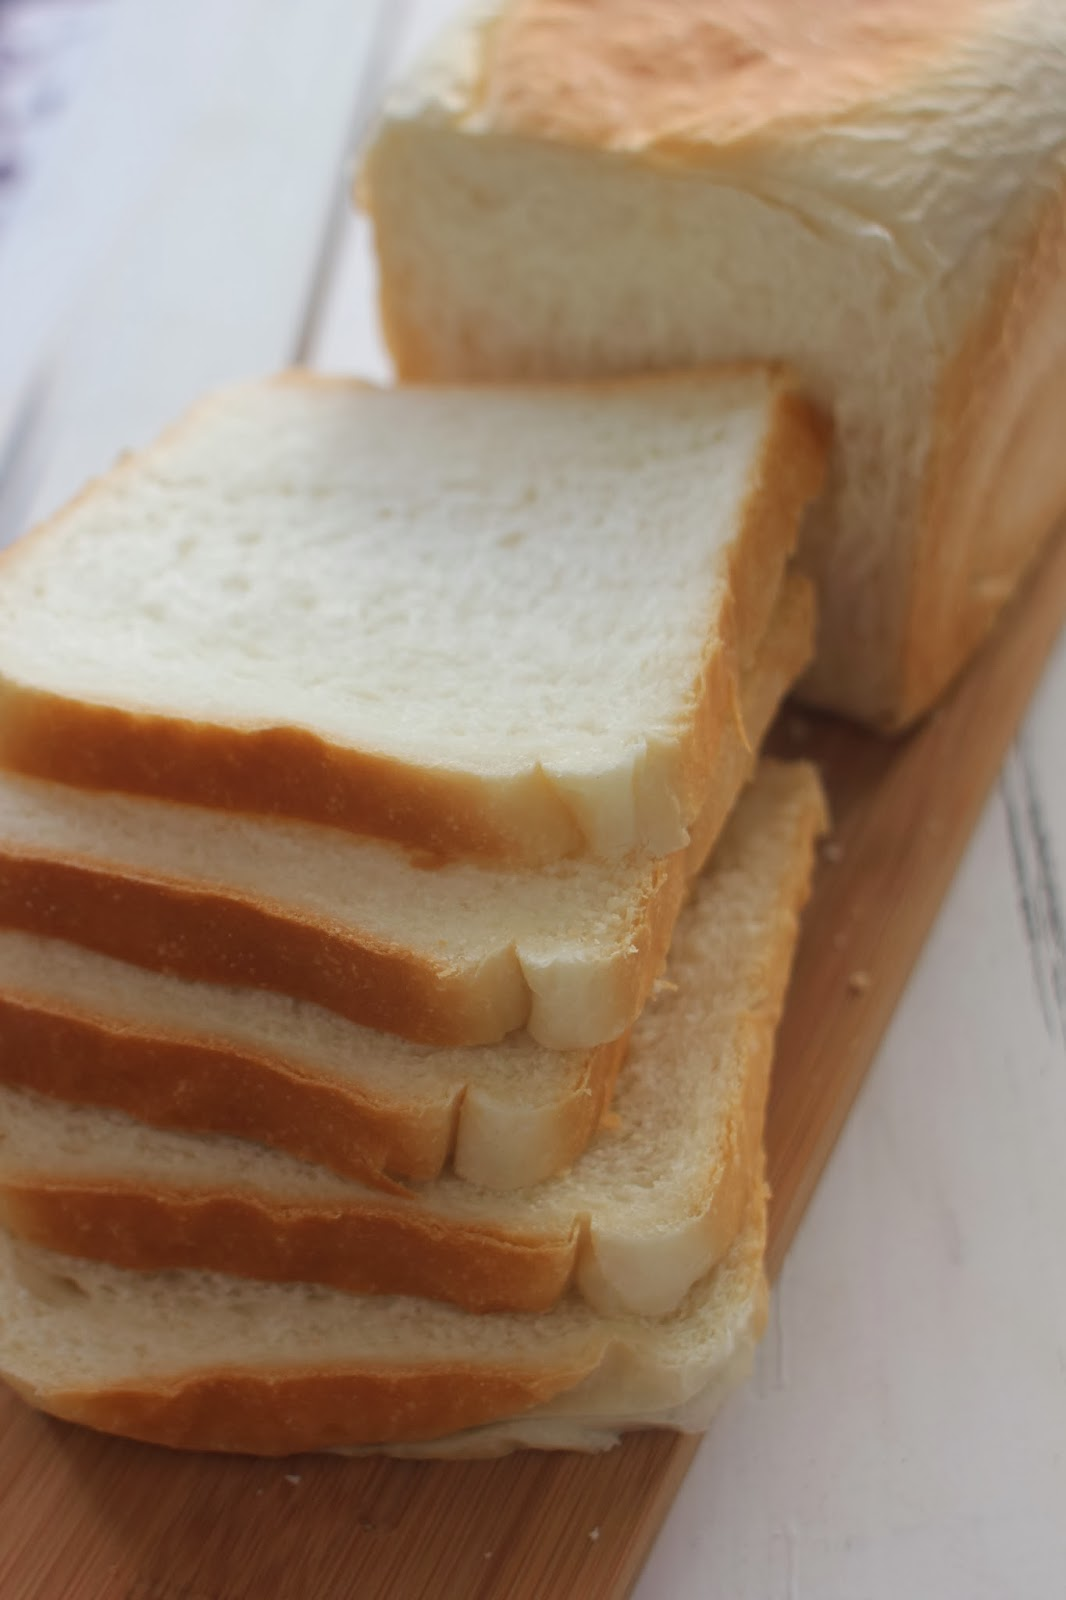 Wubaochun Milk Loaf 吳寶春金牌牛奶吐司